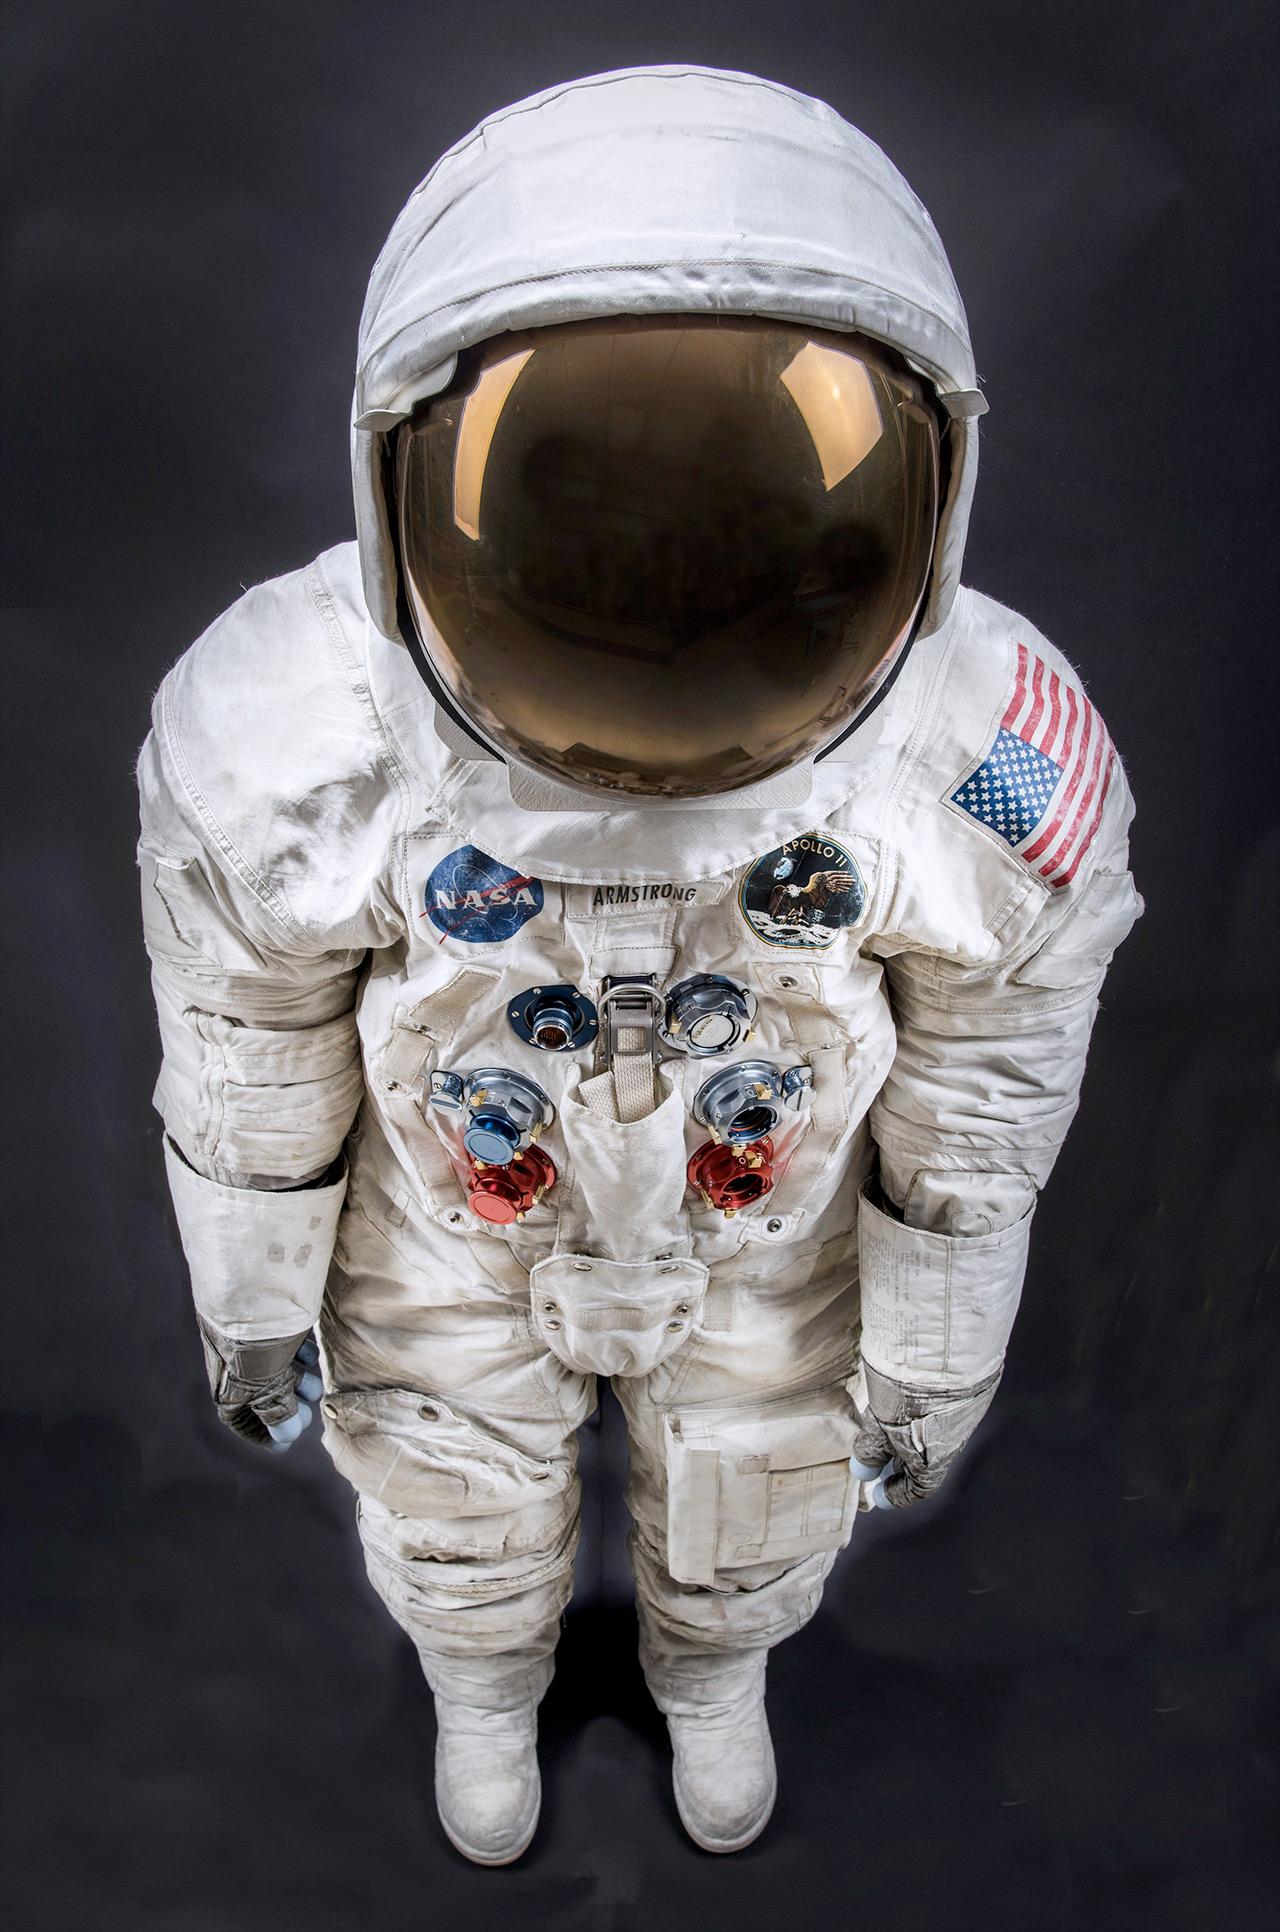 apollo 11 spacesuit weight - photo #23